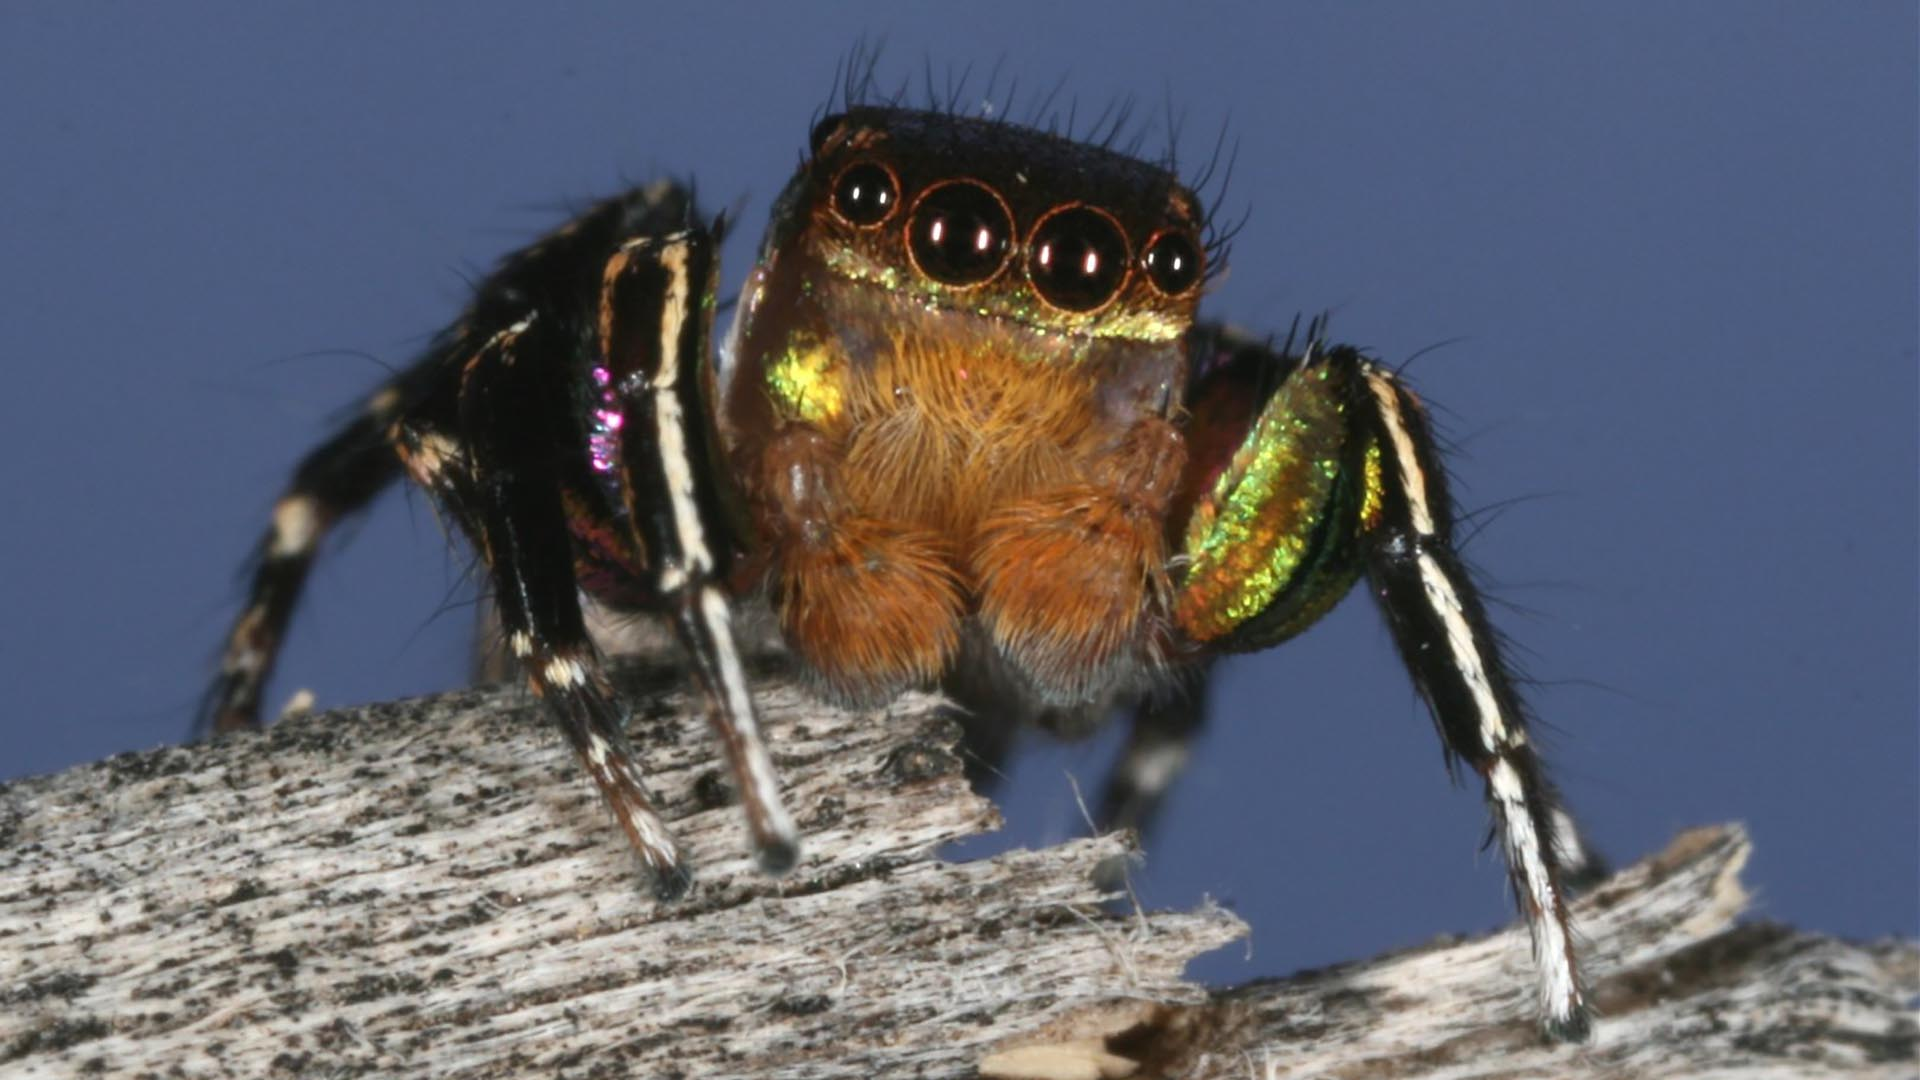 jumping spider eyes hero